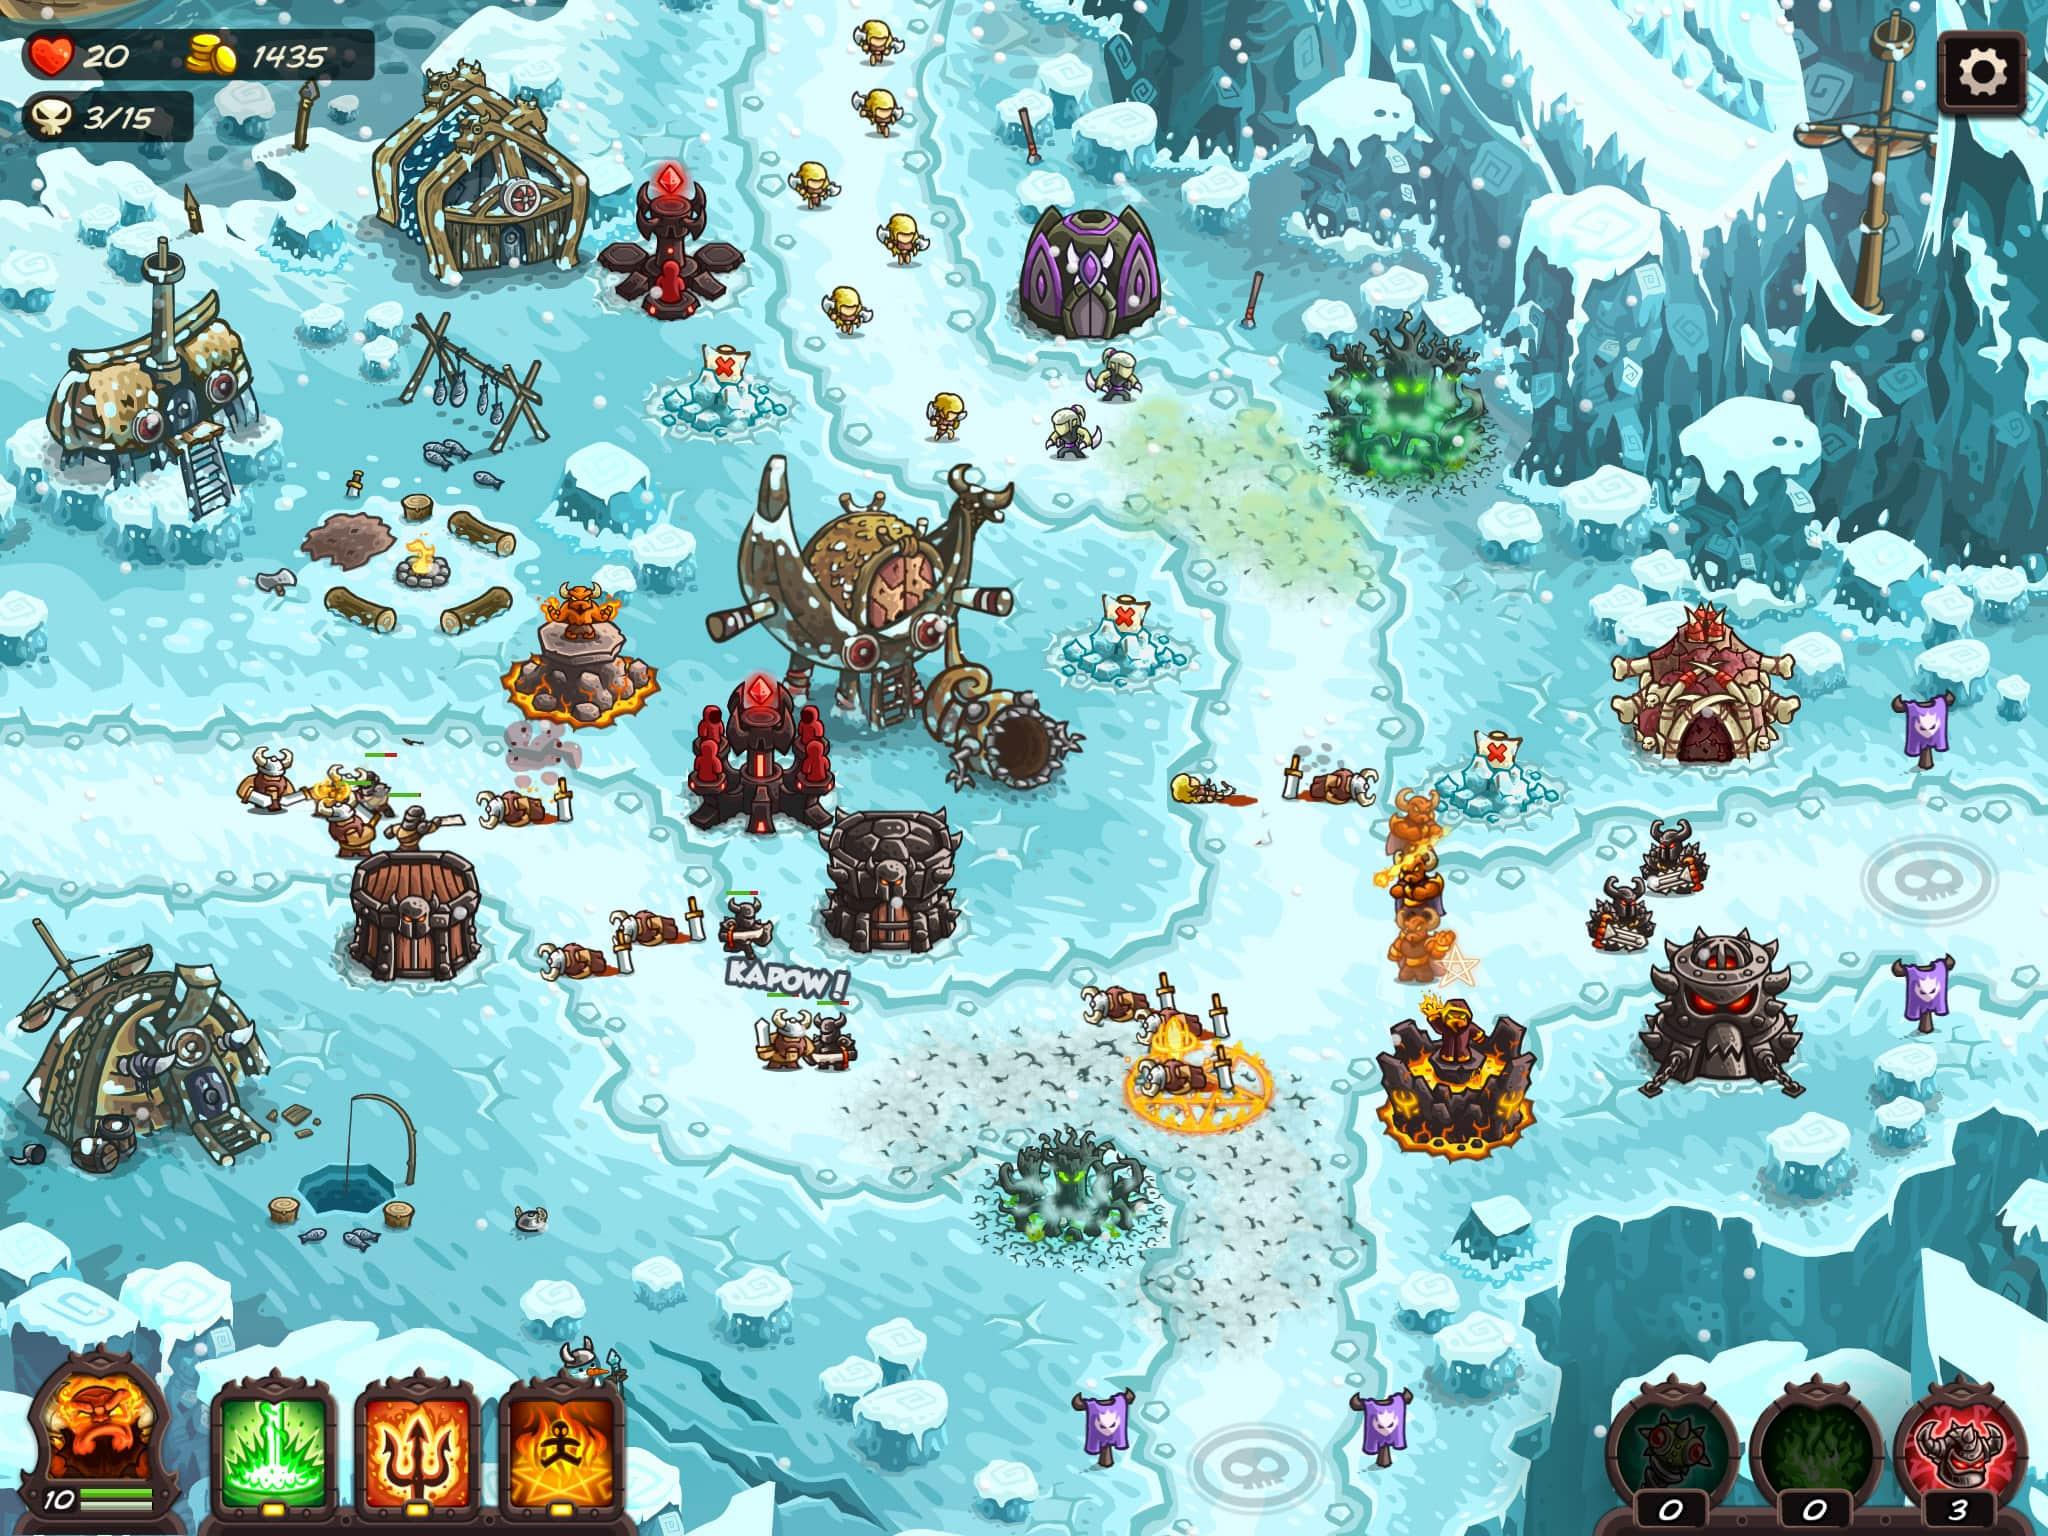 kingdom_rush_vengeance_screenshot02_full (1)